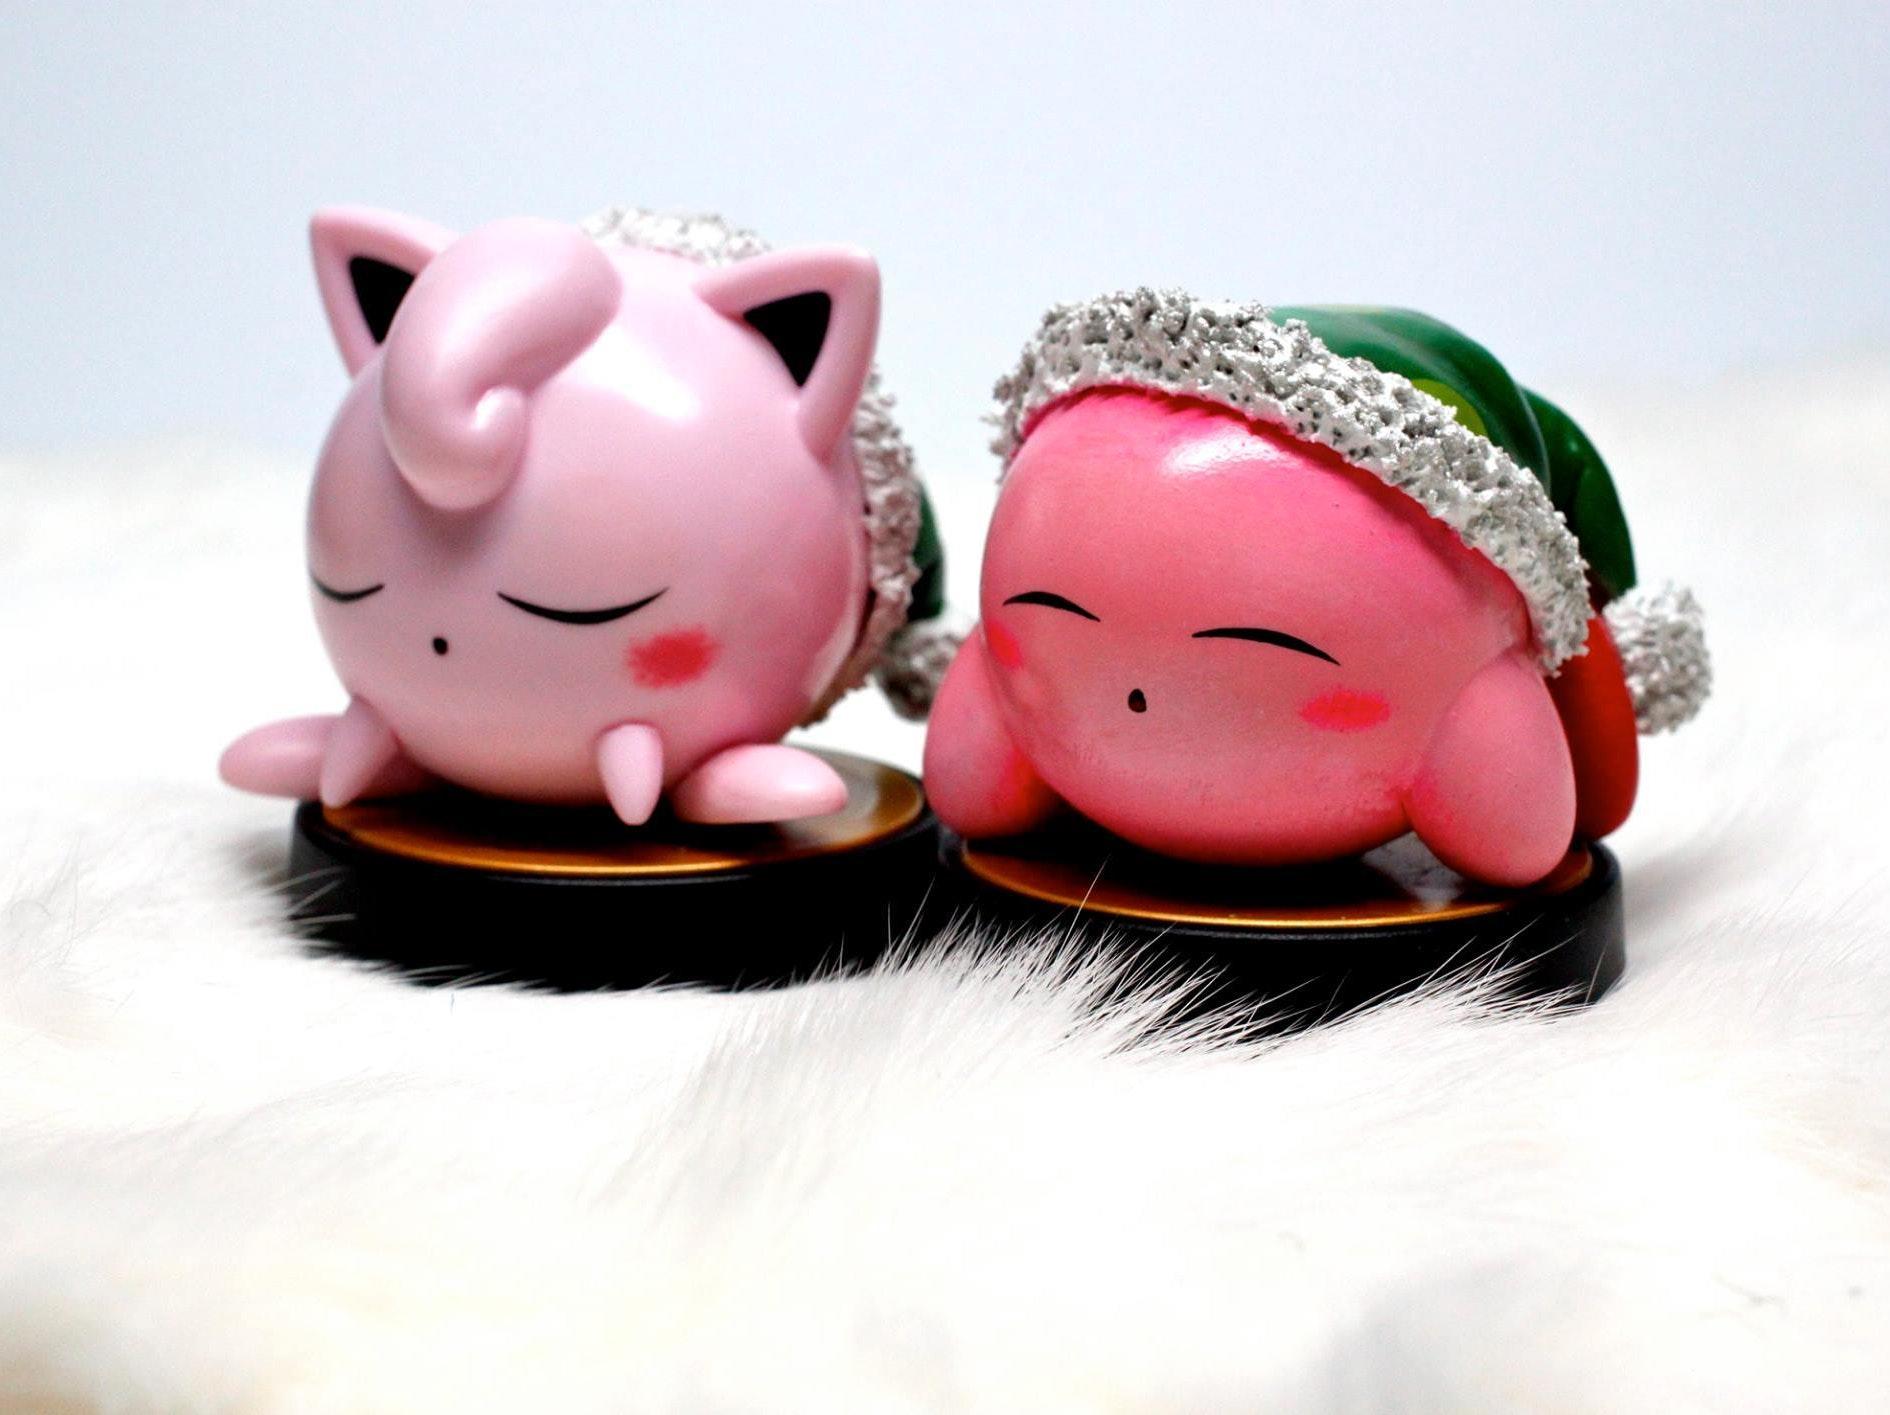 Sleepy Jigglypuff and Kirby are a good use of customs.